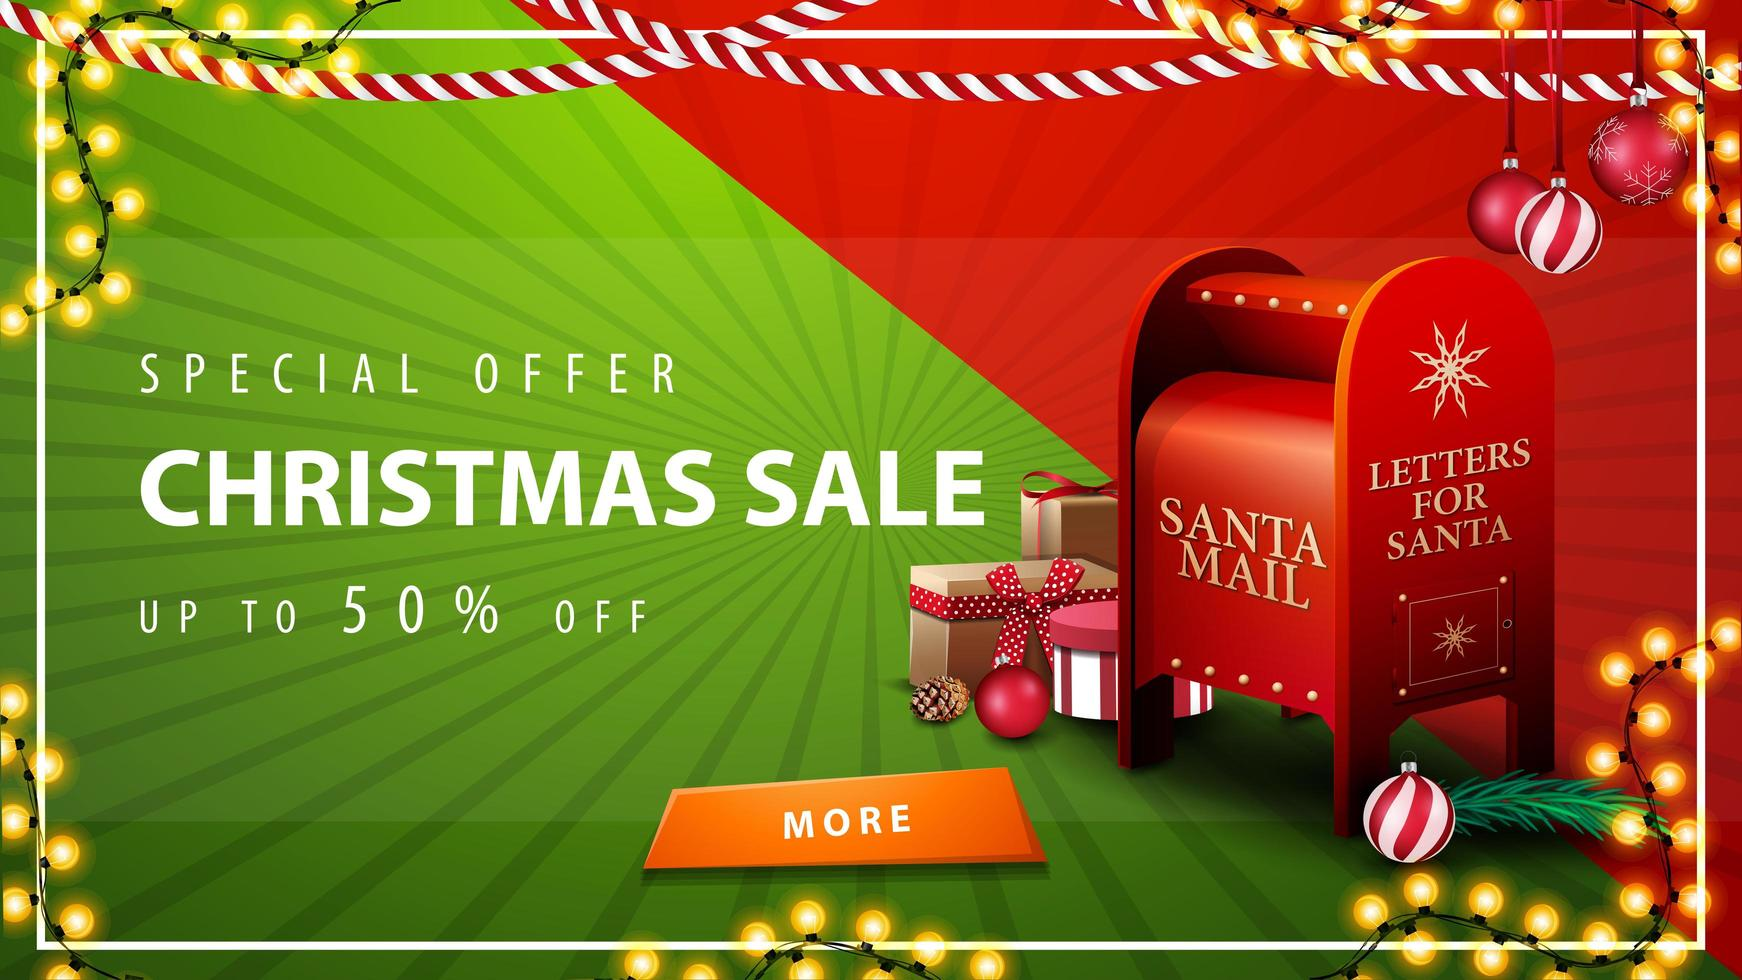 speciale aanbieding, kerstuitverkoop, tot 50 korting, mooie rode en groene kortingsbanner met slingers, knop en kerstman brievenbus met cadeautjes vector